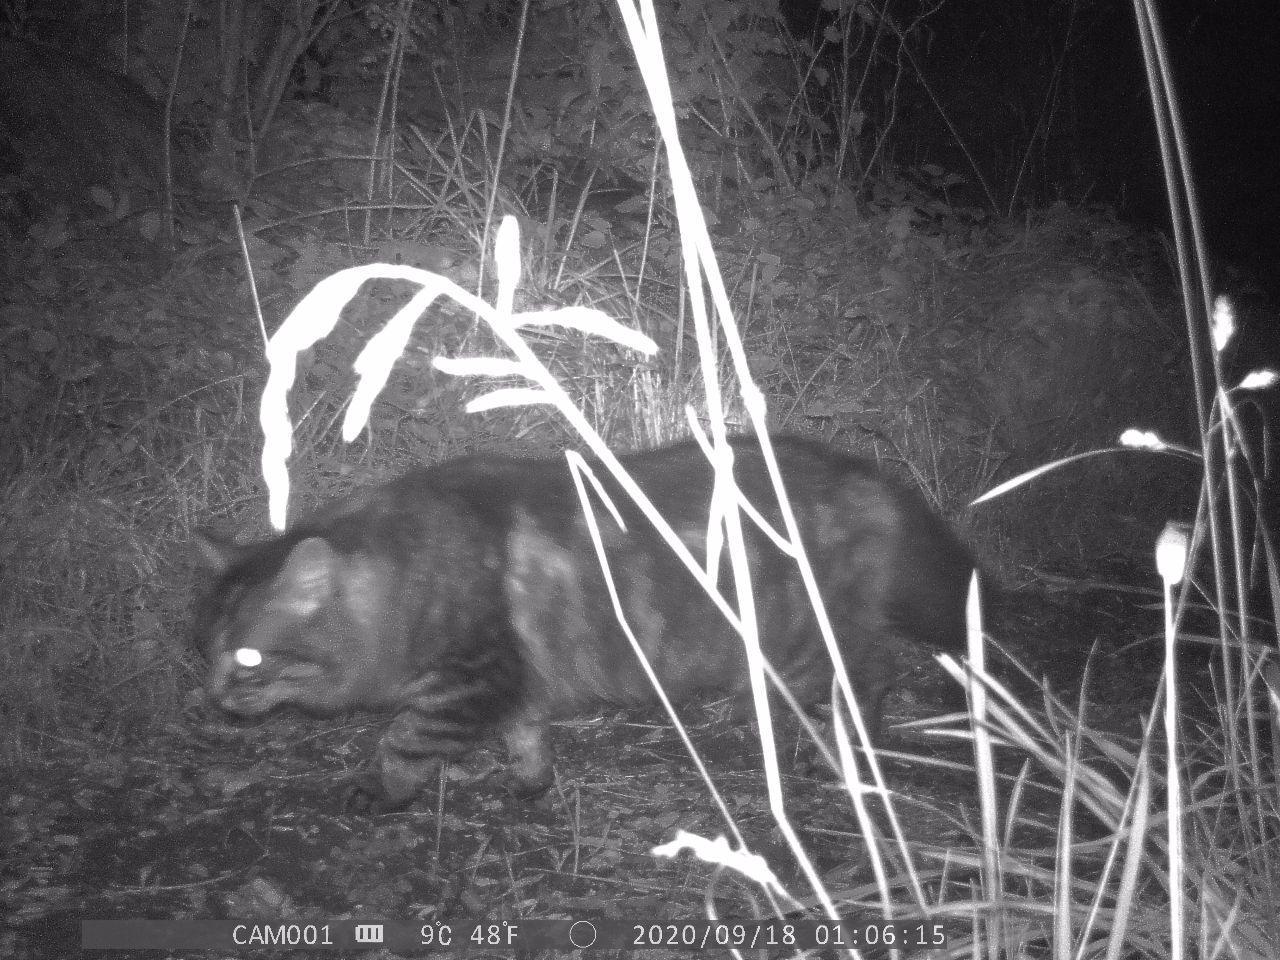 Wildcat crosses the frame